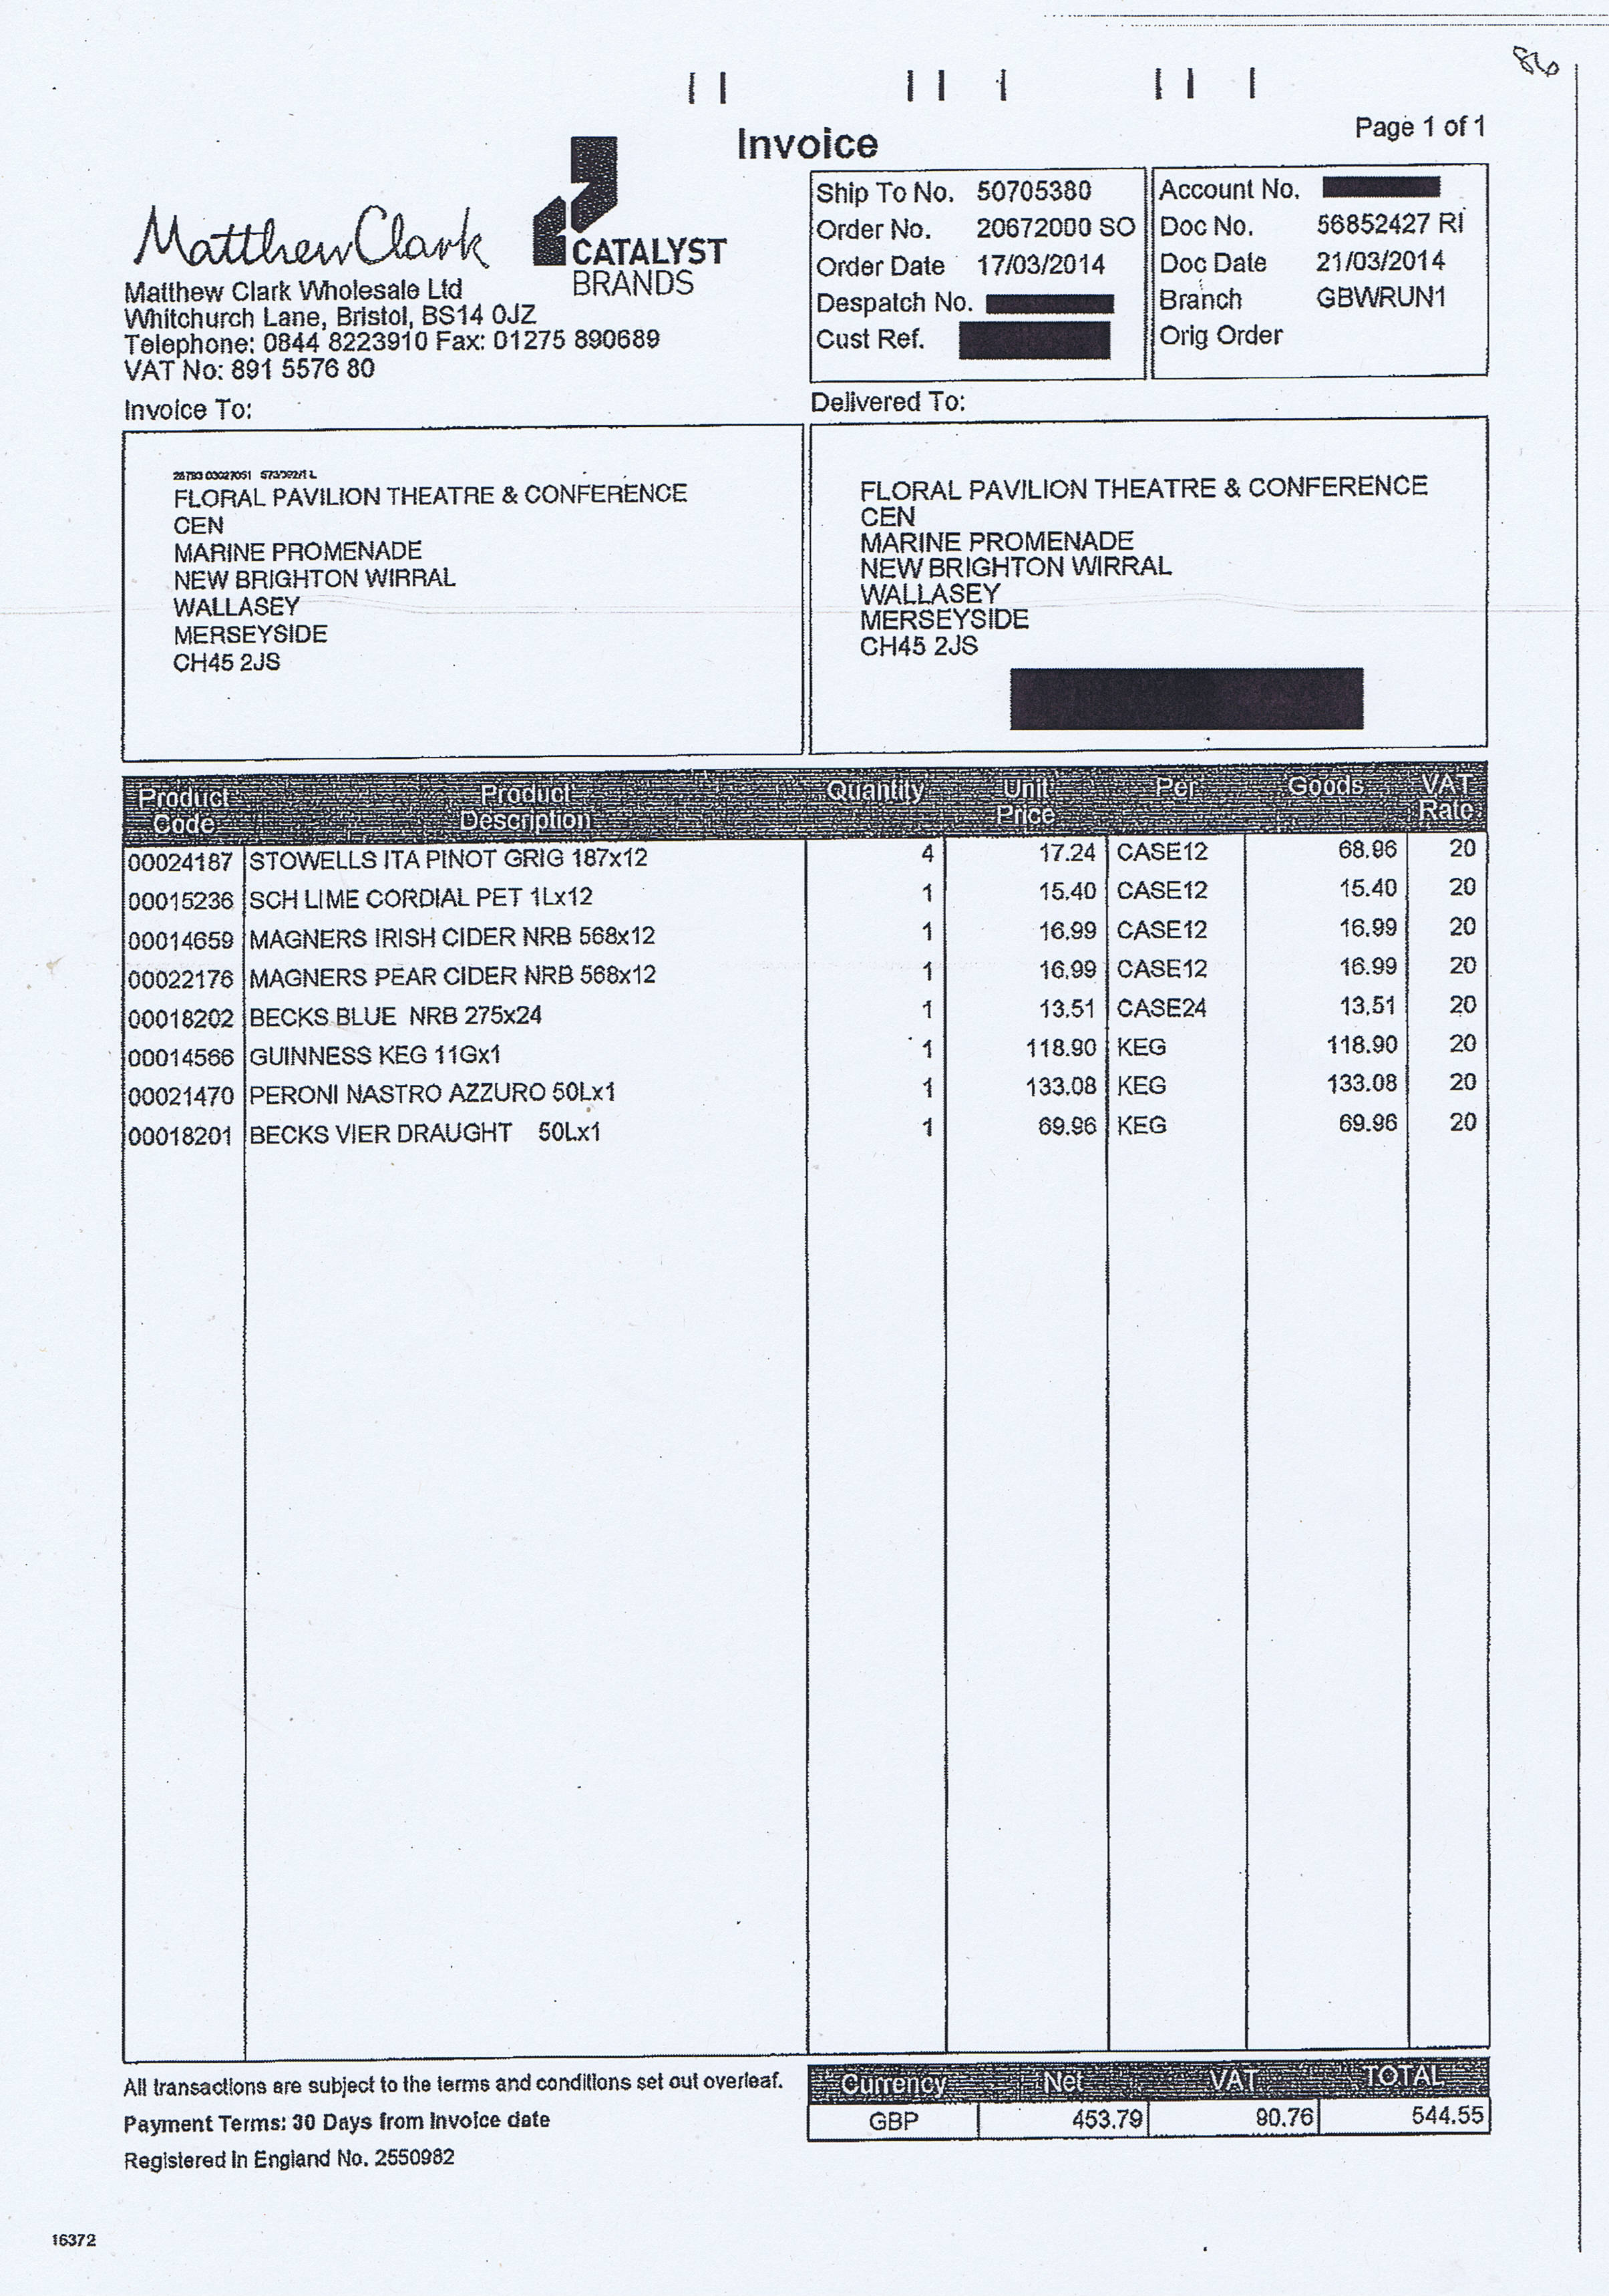 Wirral Council invoice 86 Matthew Clark Wholesale Ltd £544.55